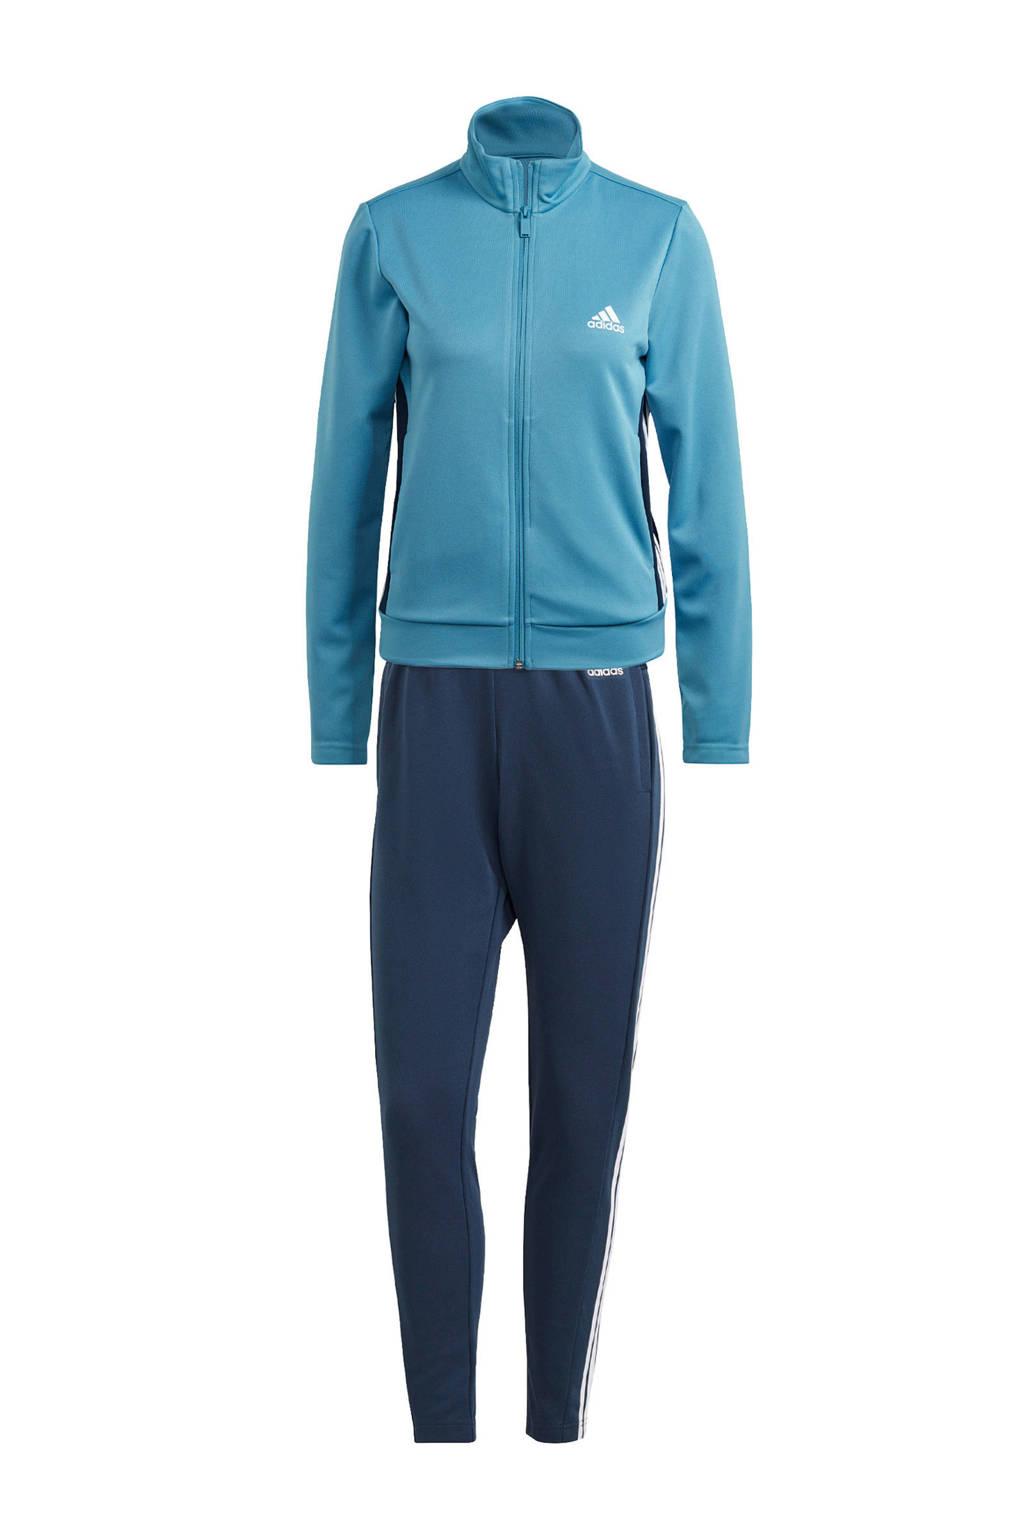 adidas Performance trainingspak donkerblauw/lichtblauw, Donkerblauw/lichtblauw